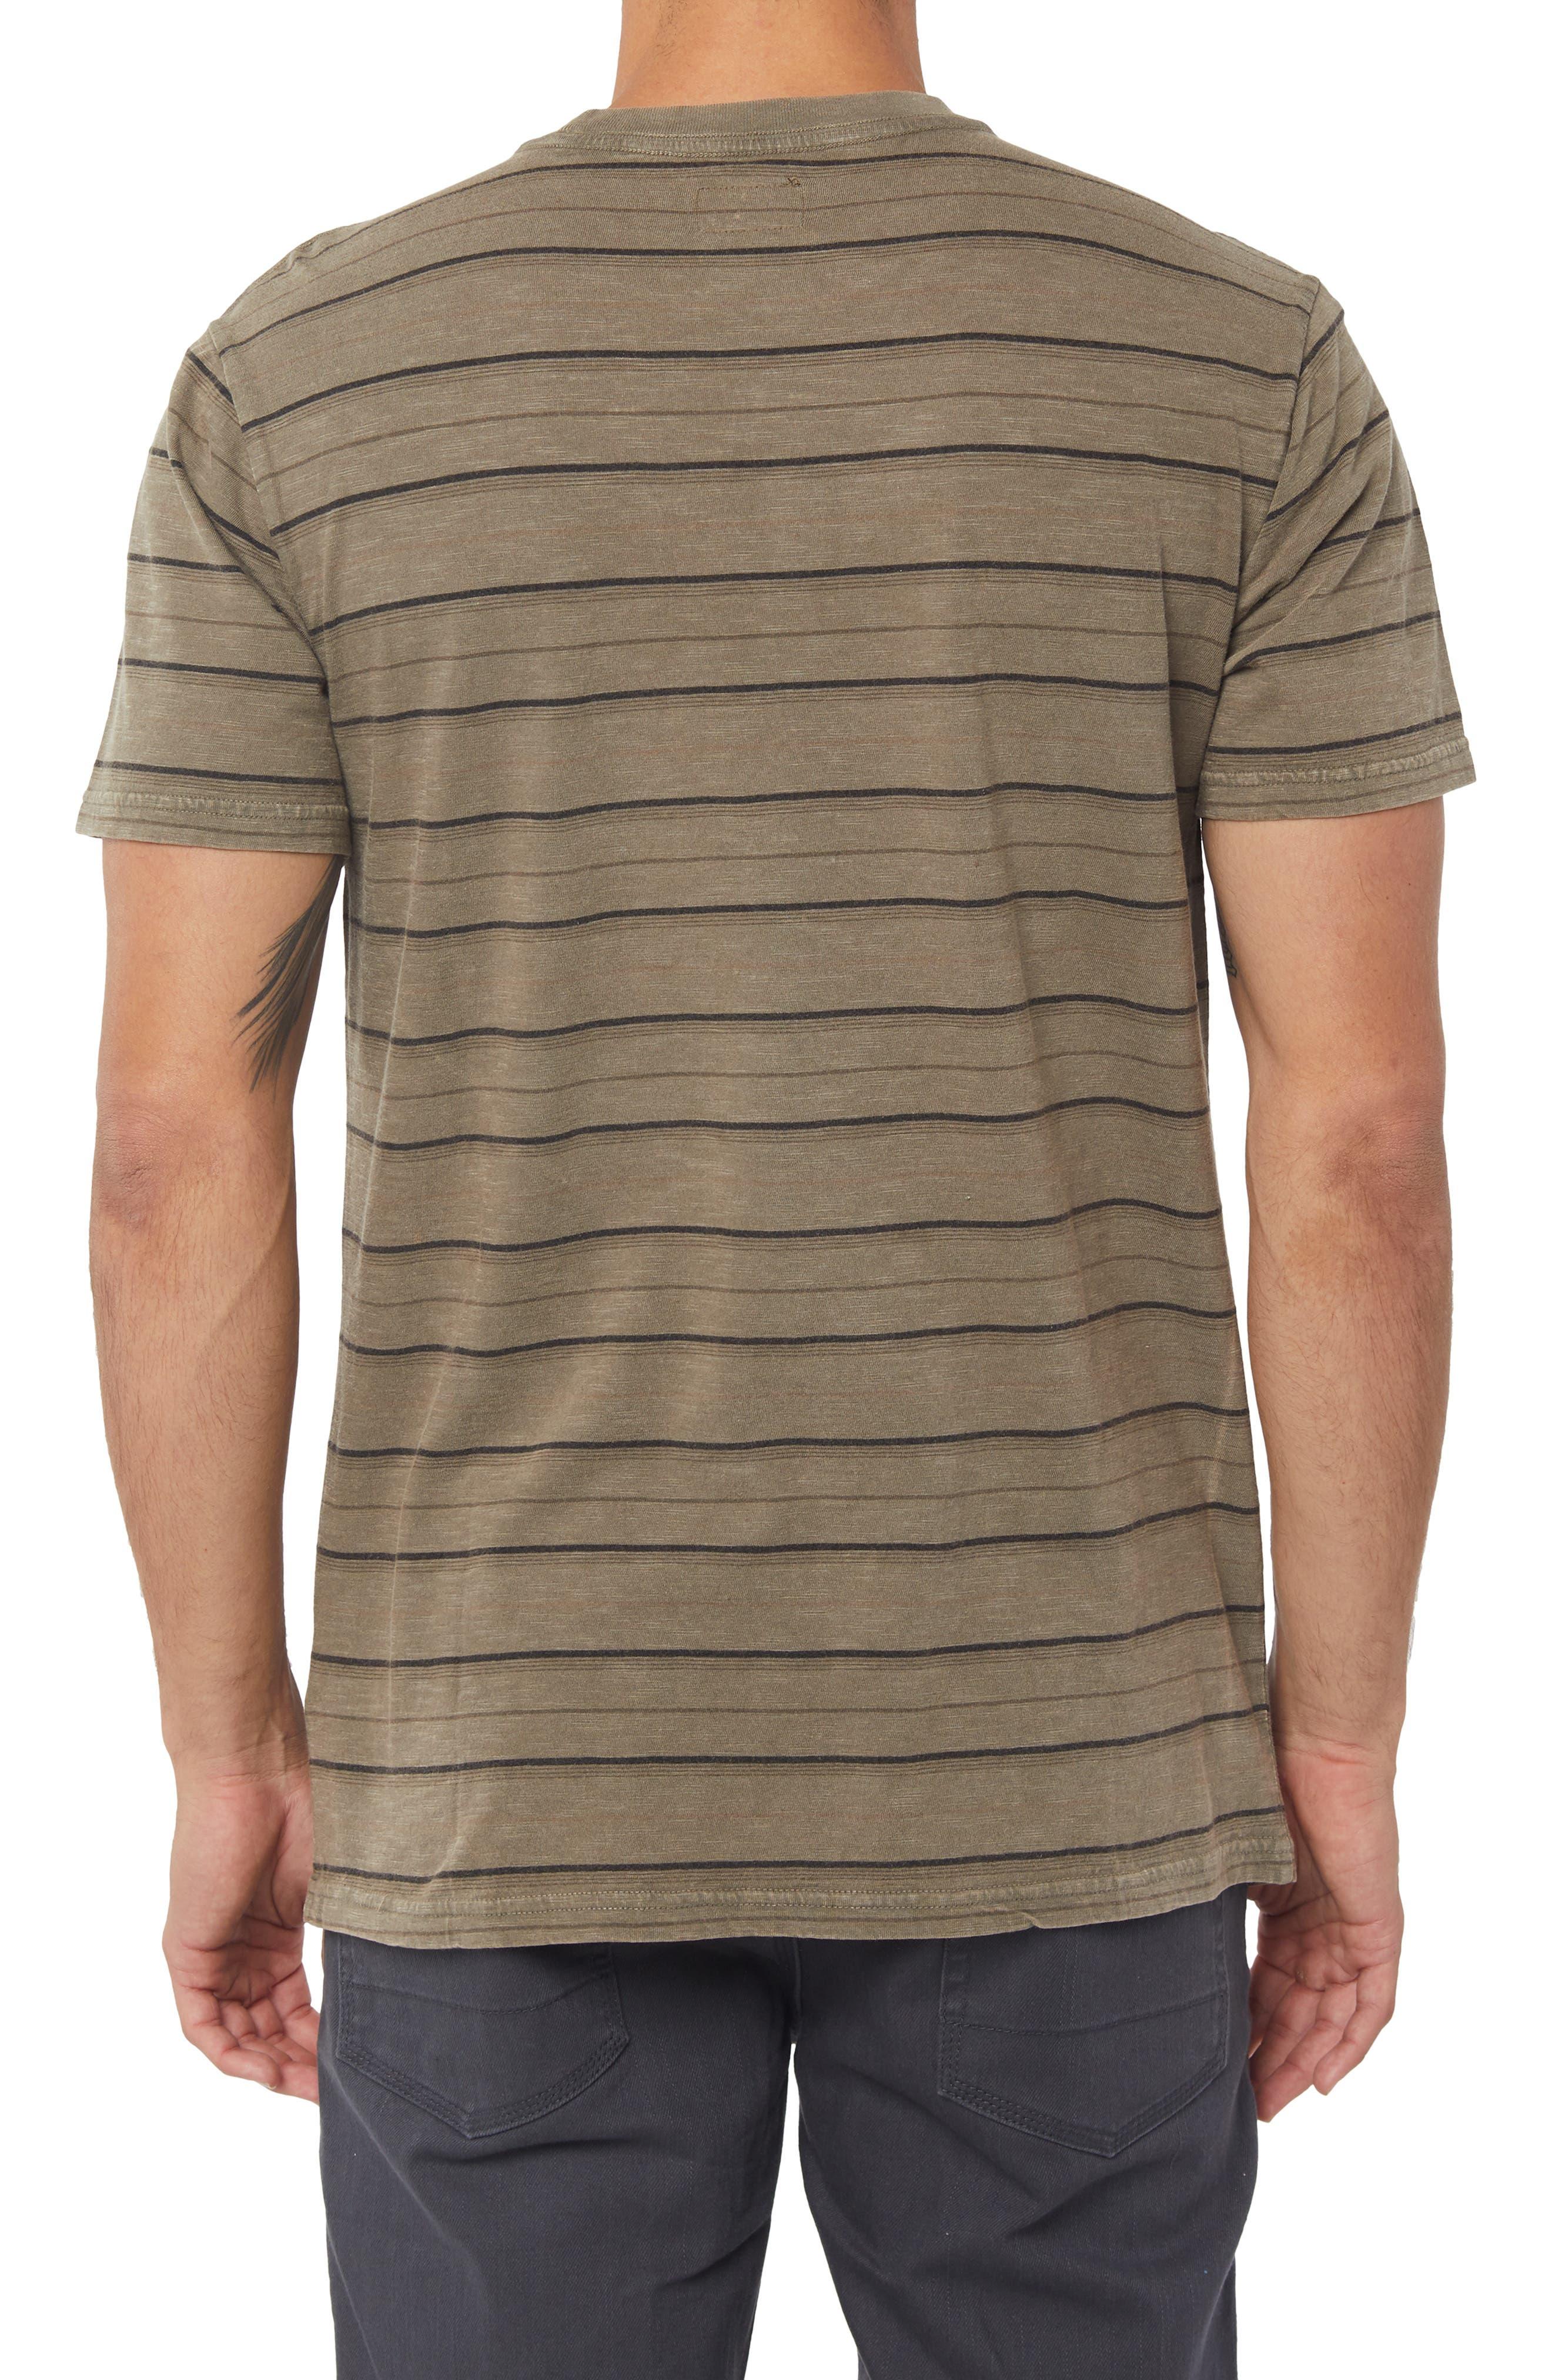 O'Neil Detroit Dinsmore Crew T-shirt,                             Alternate thumbnail 2, color,                             MILITARY